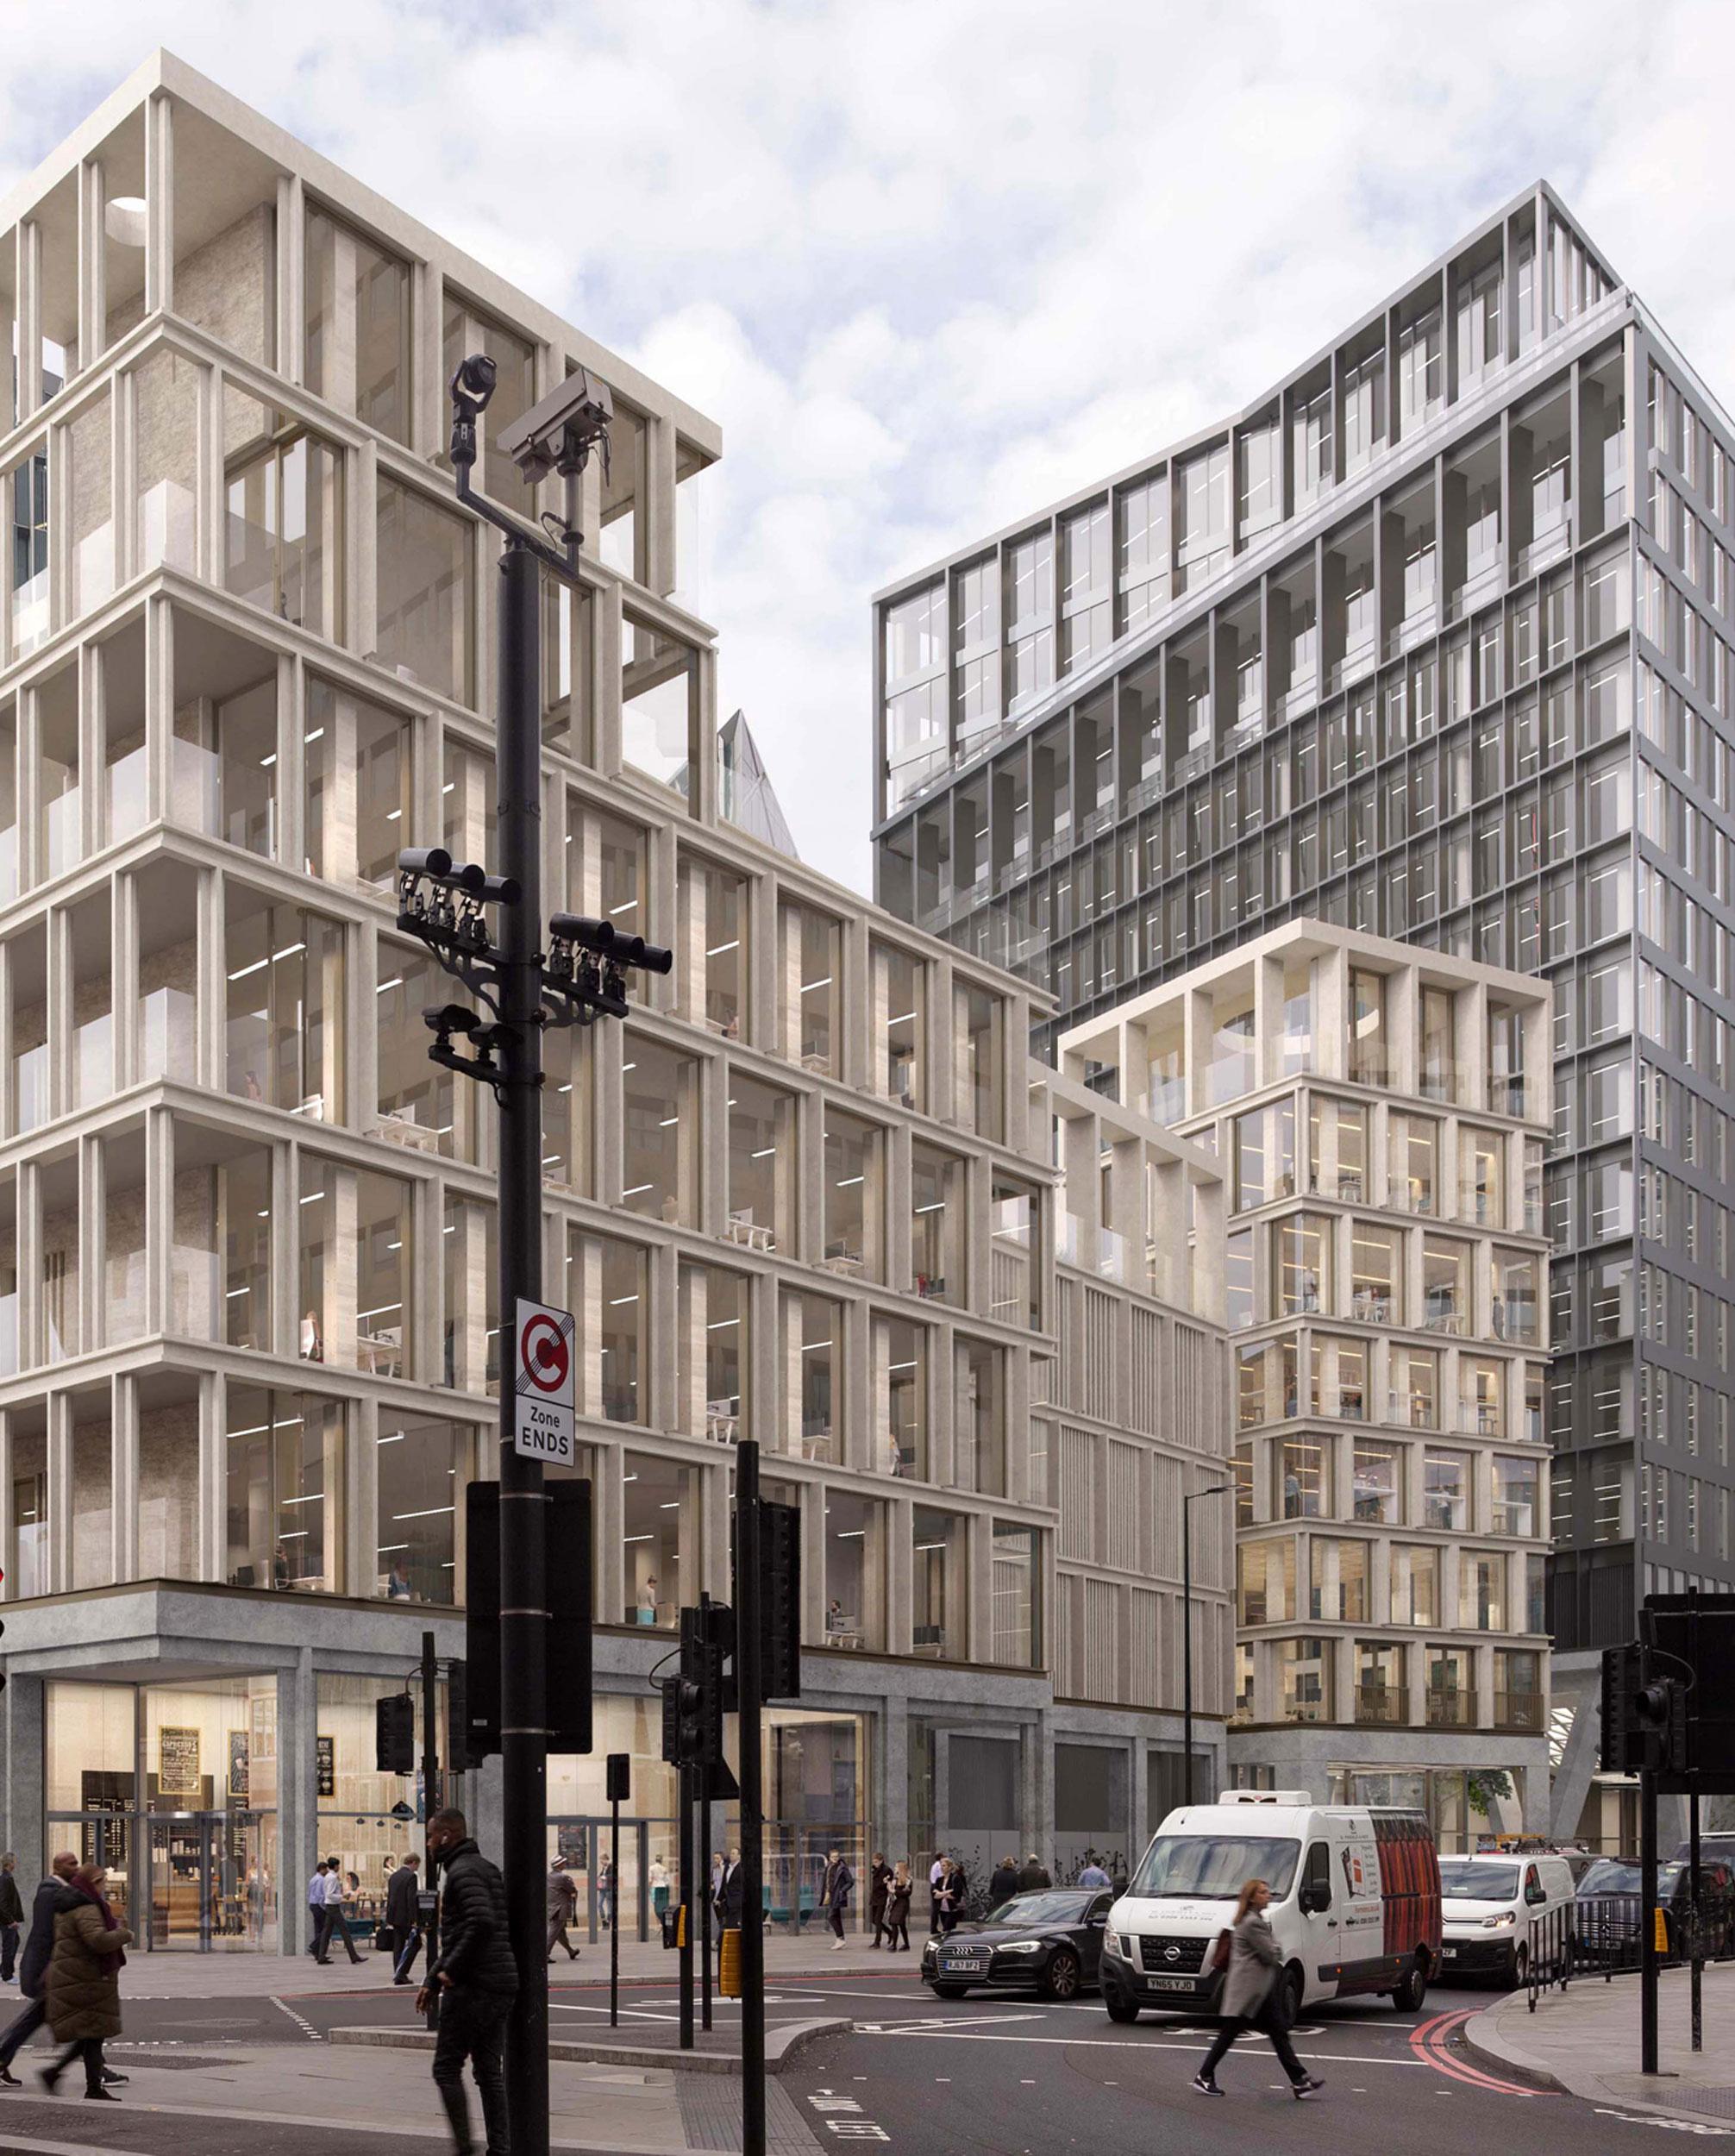 Nova SW1 complex in London